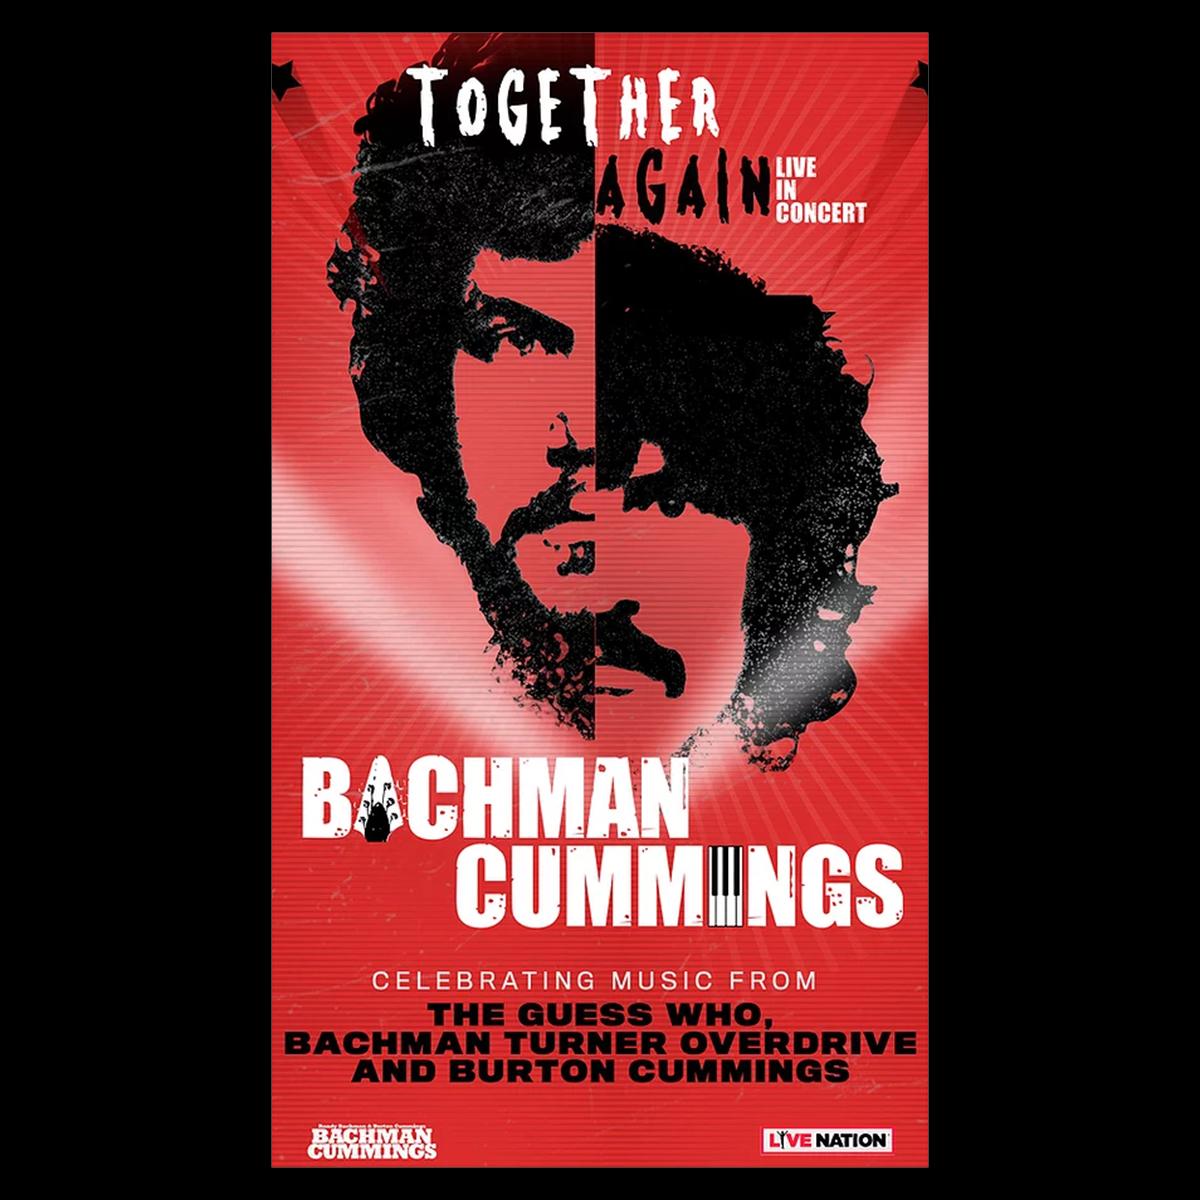 Bachman/Cummings Postpone Planned North American Tour